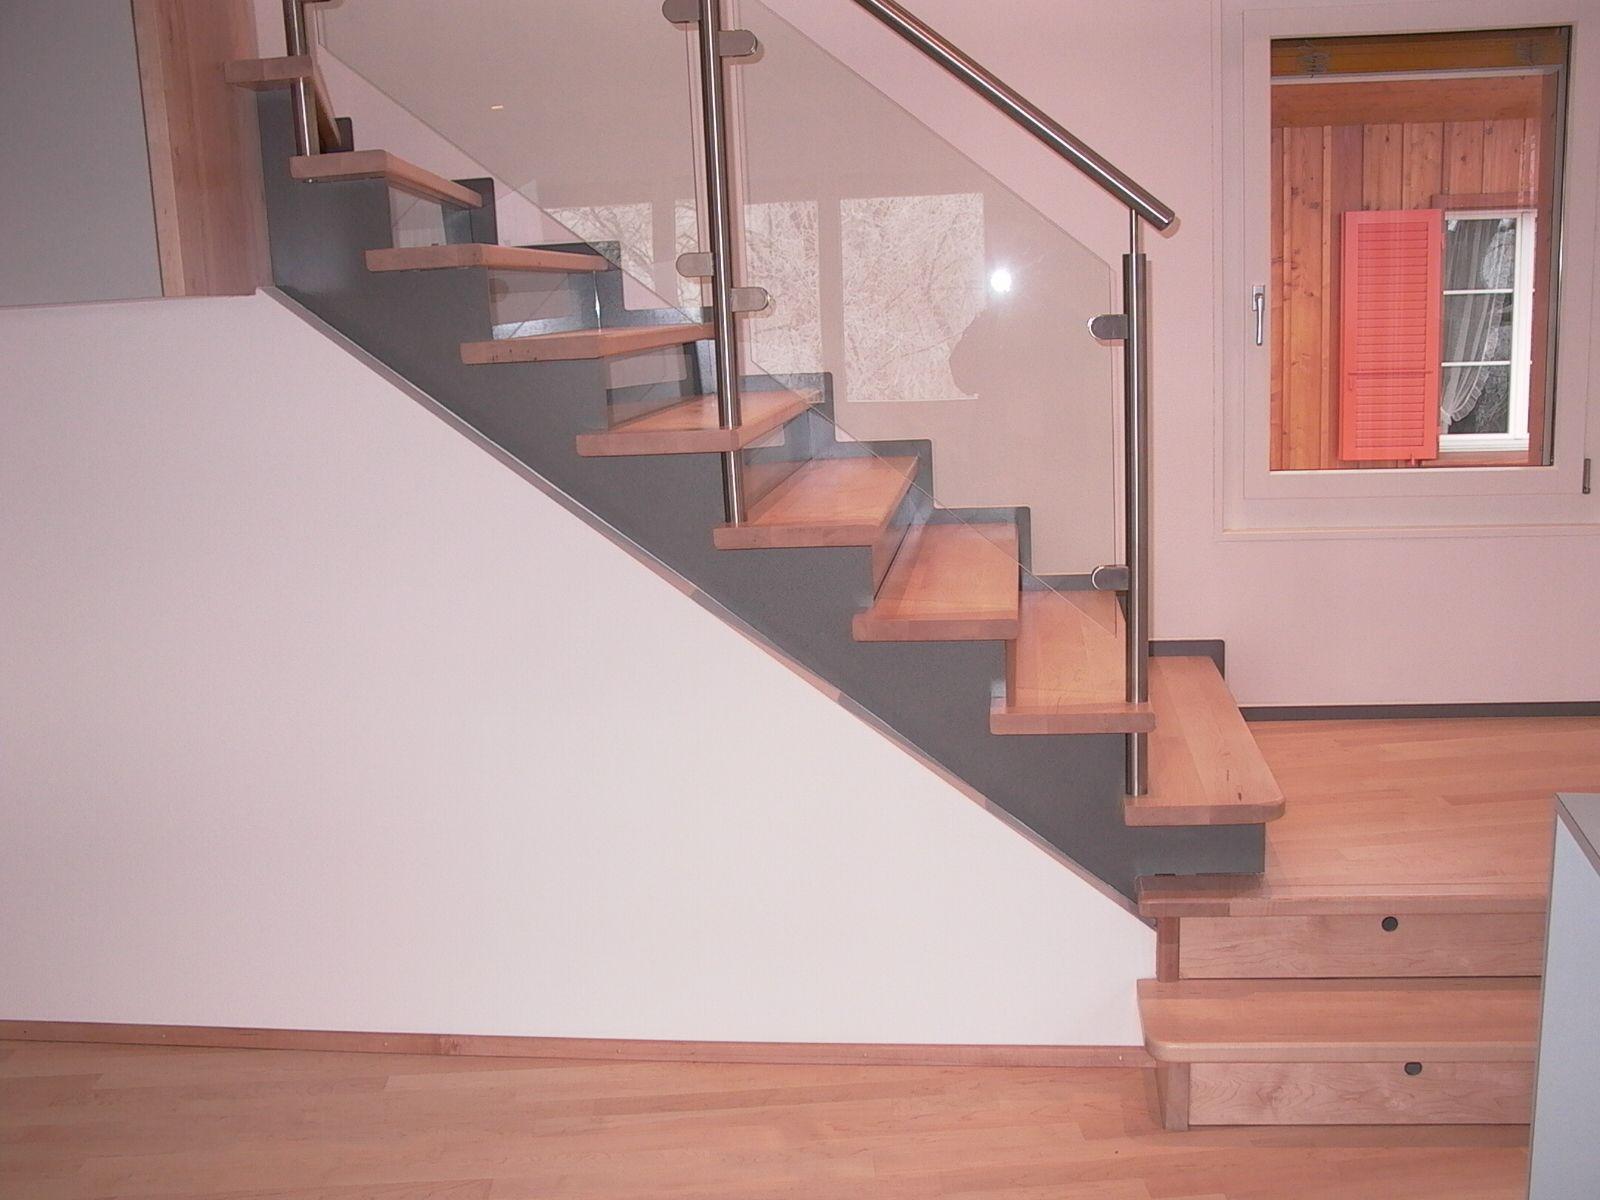 Stair Image 44